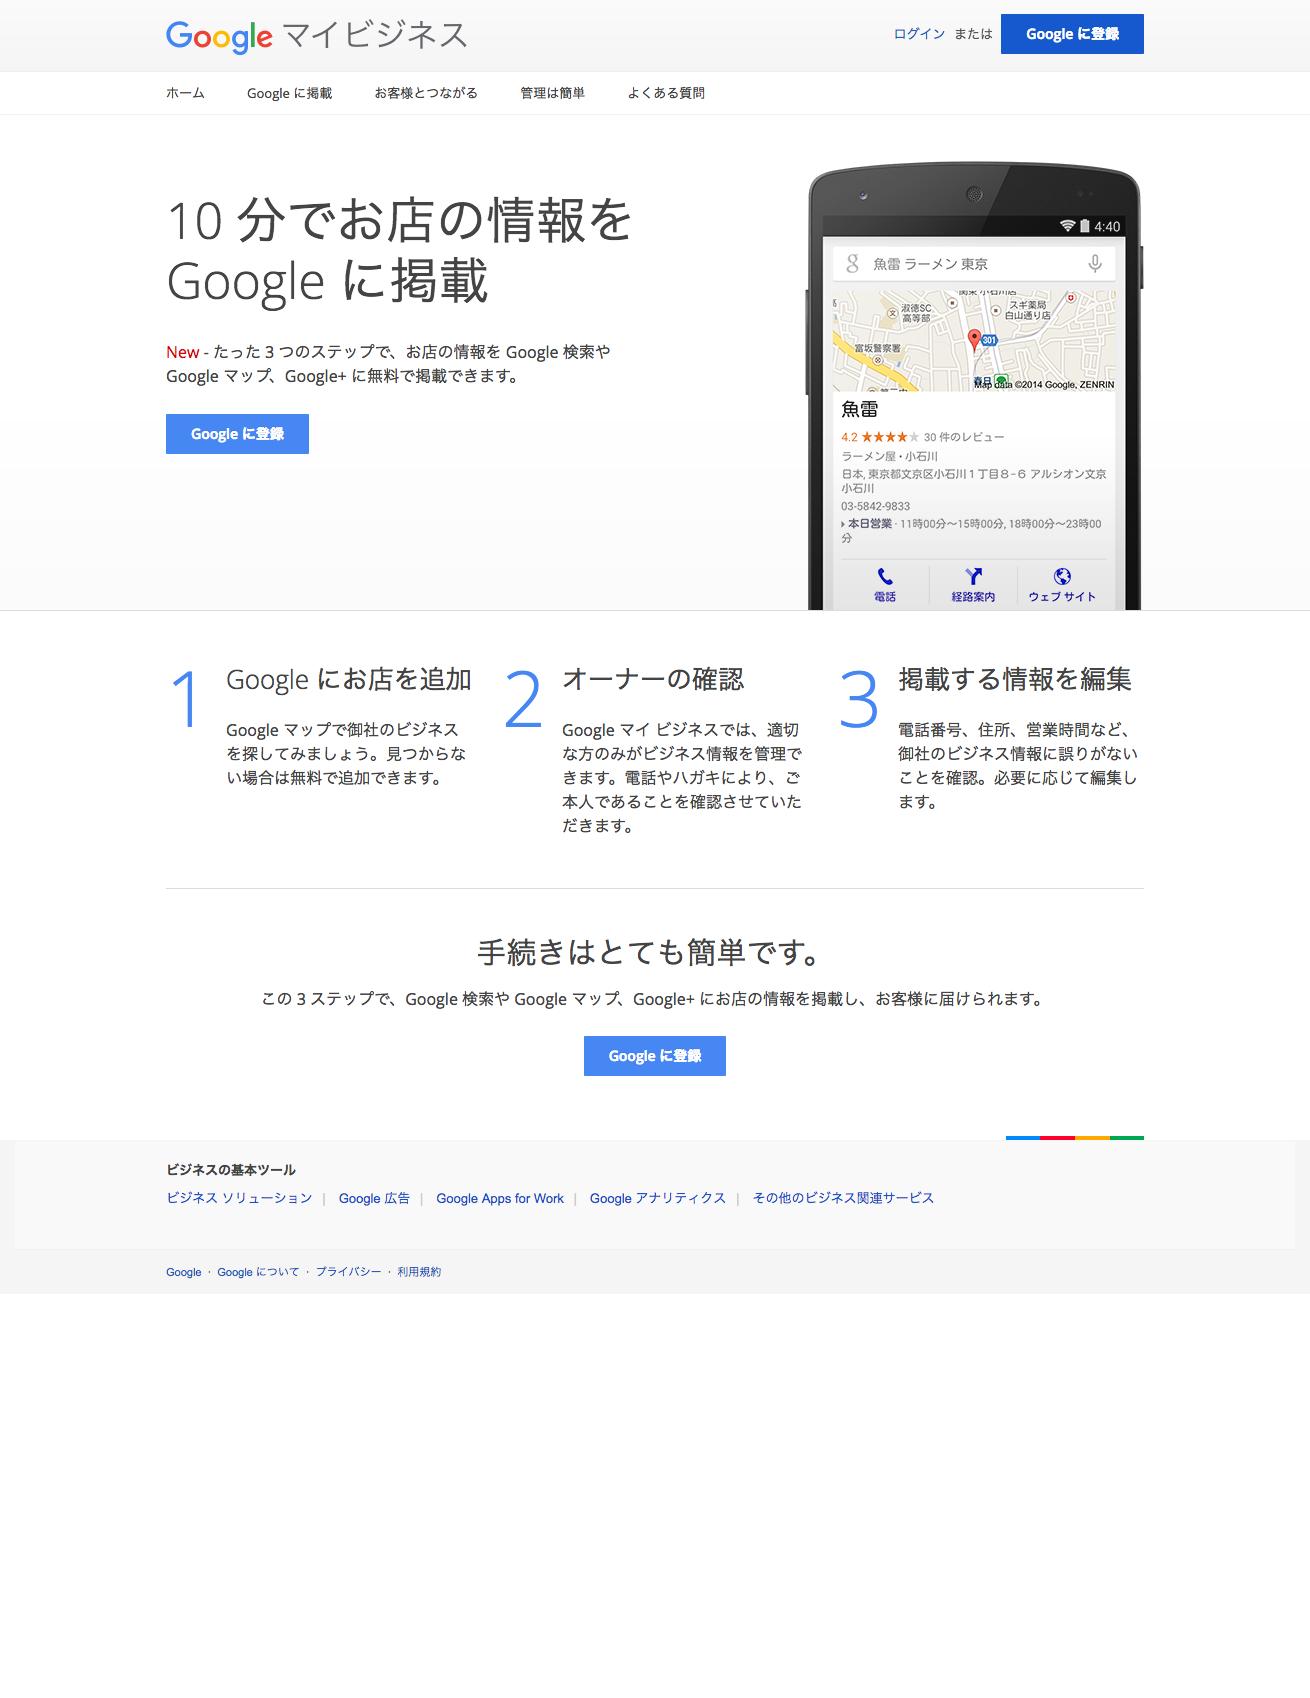 FireShot Capture 007 - Google マイビジネス - https___www.google.co.jp_business_get-started.html